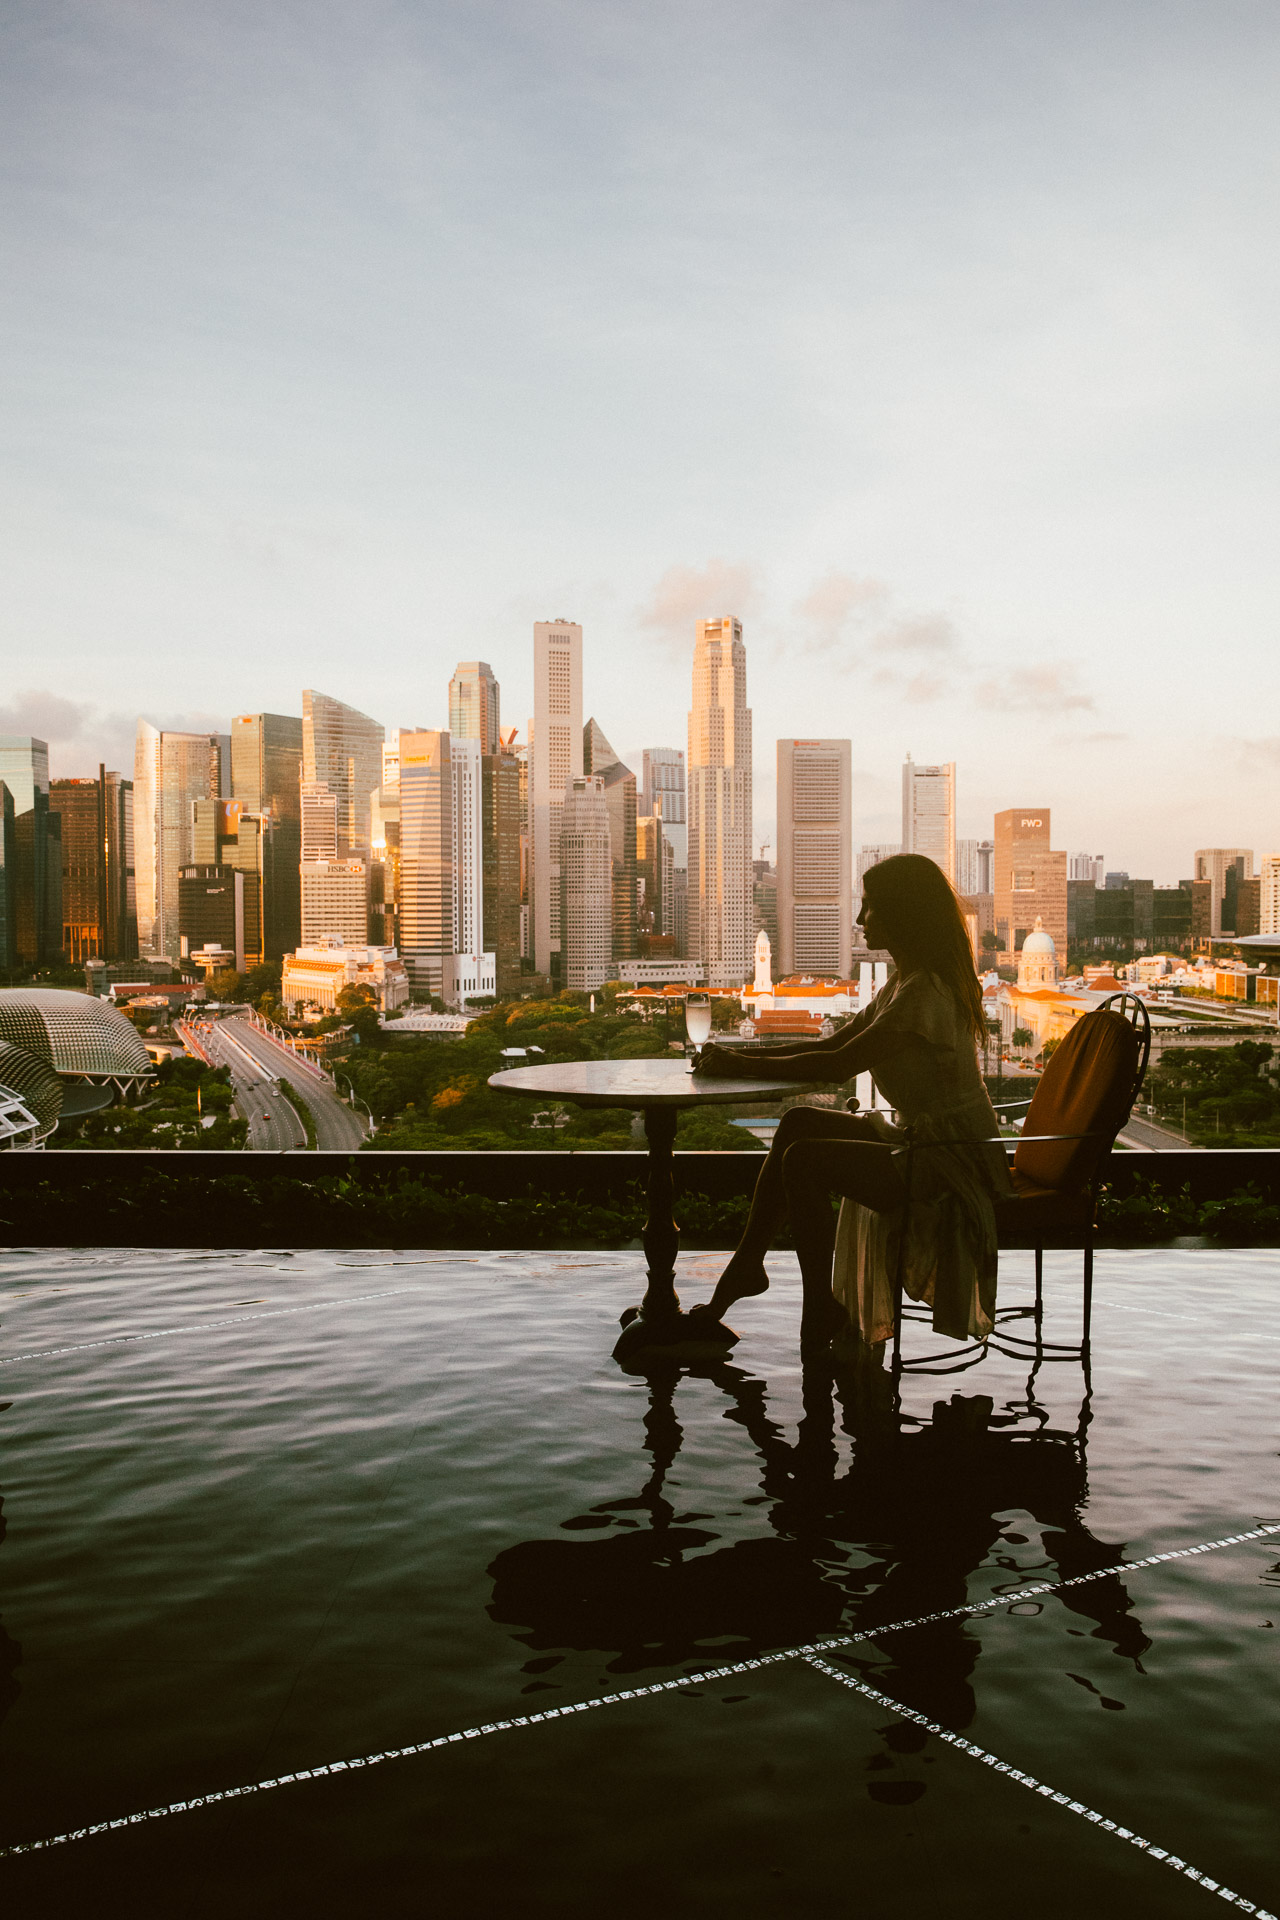 aviation-photographer-lifestyle-china-eastern-singapore-destination-2224.jpg